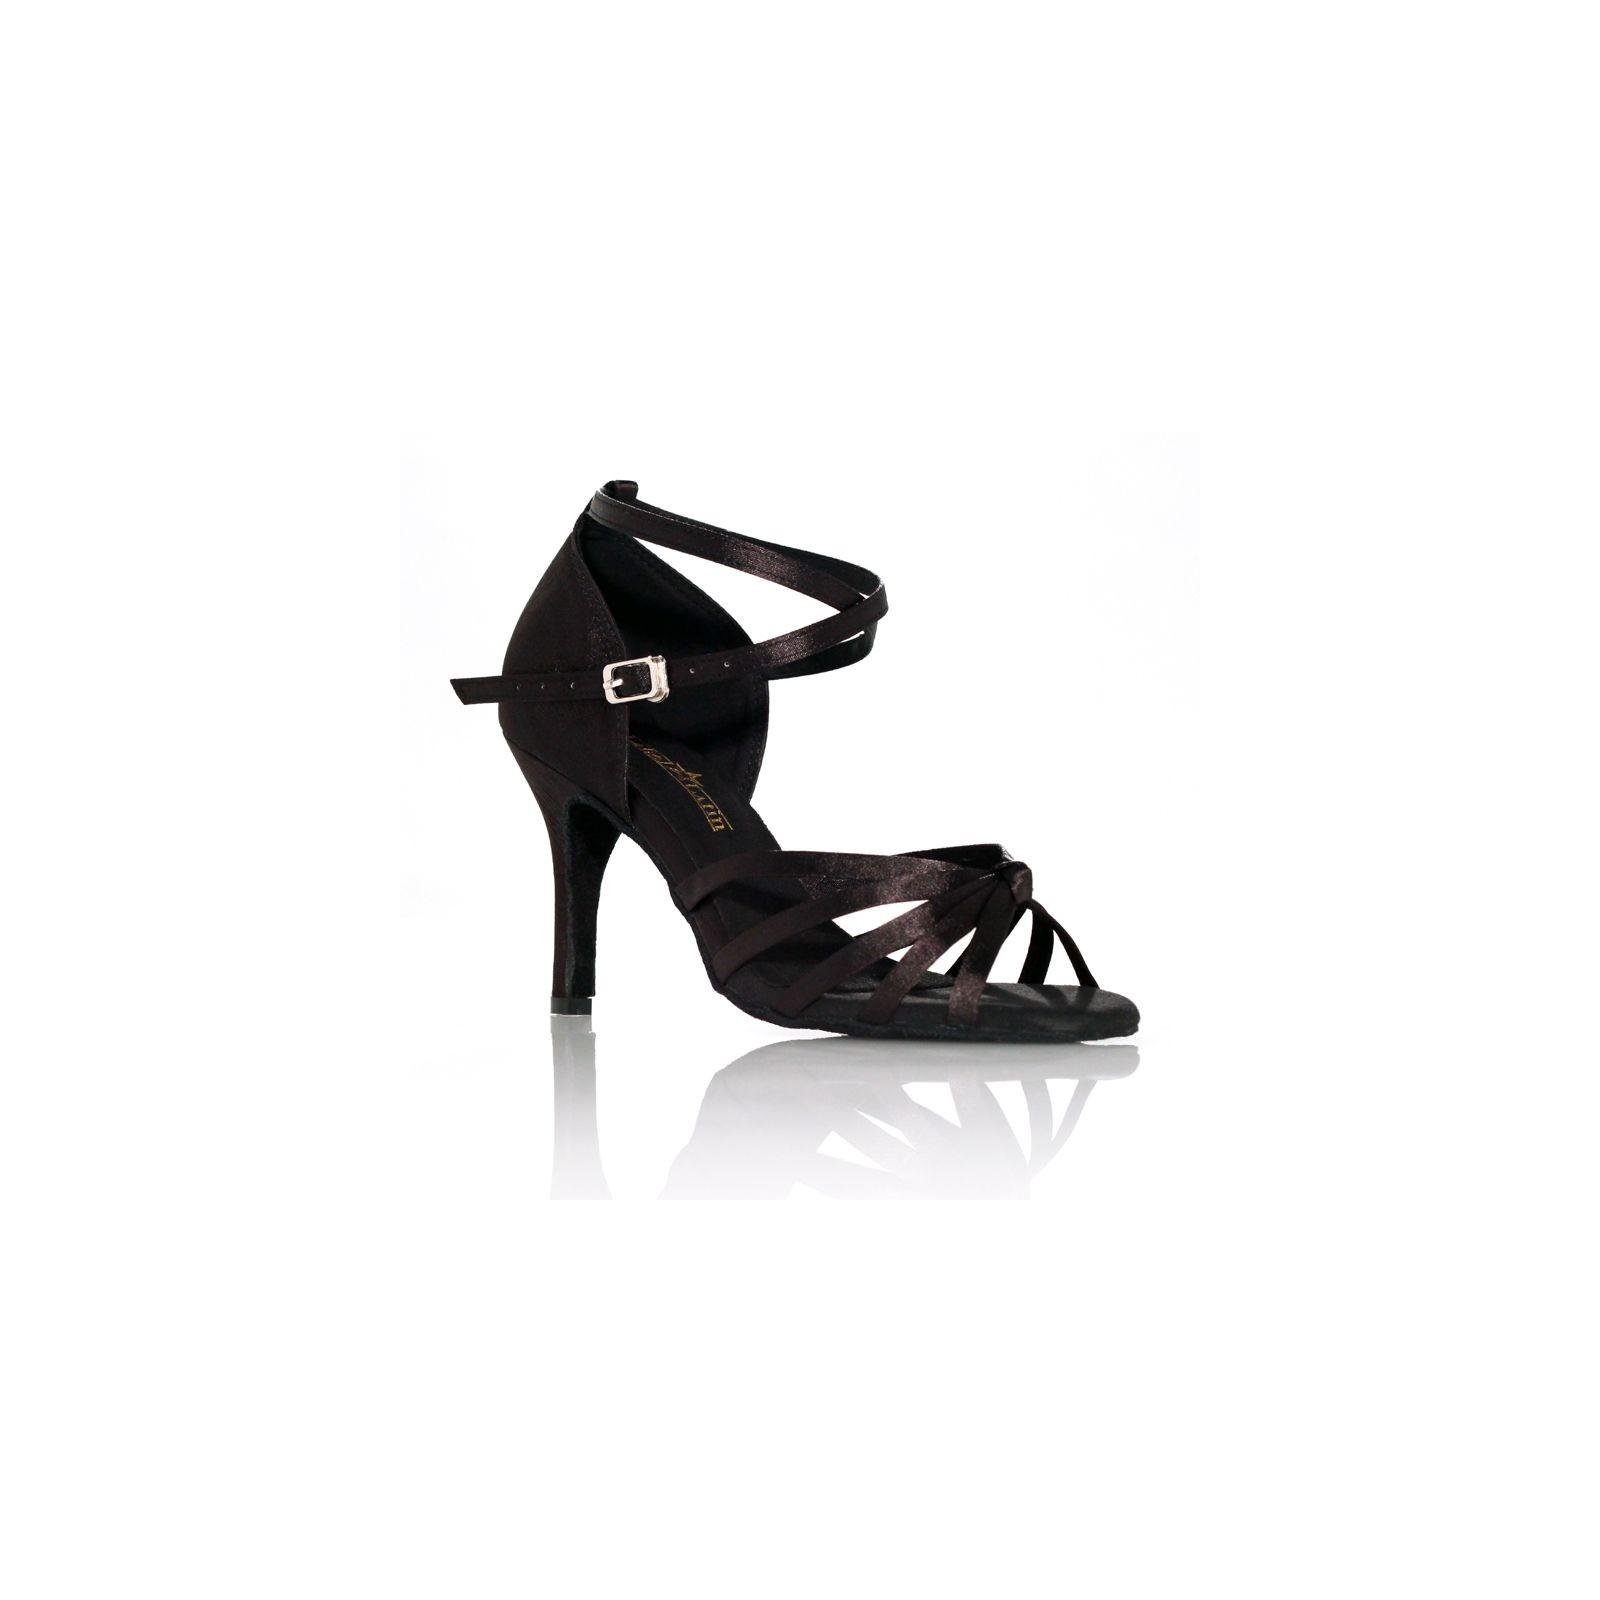 chaussures de danse label latin on 1 noire. Black Bedroom Furniture Sets. Home Design Ideas